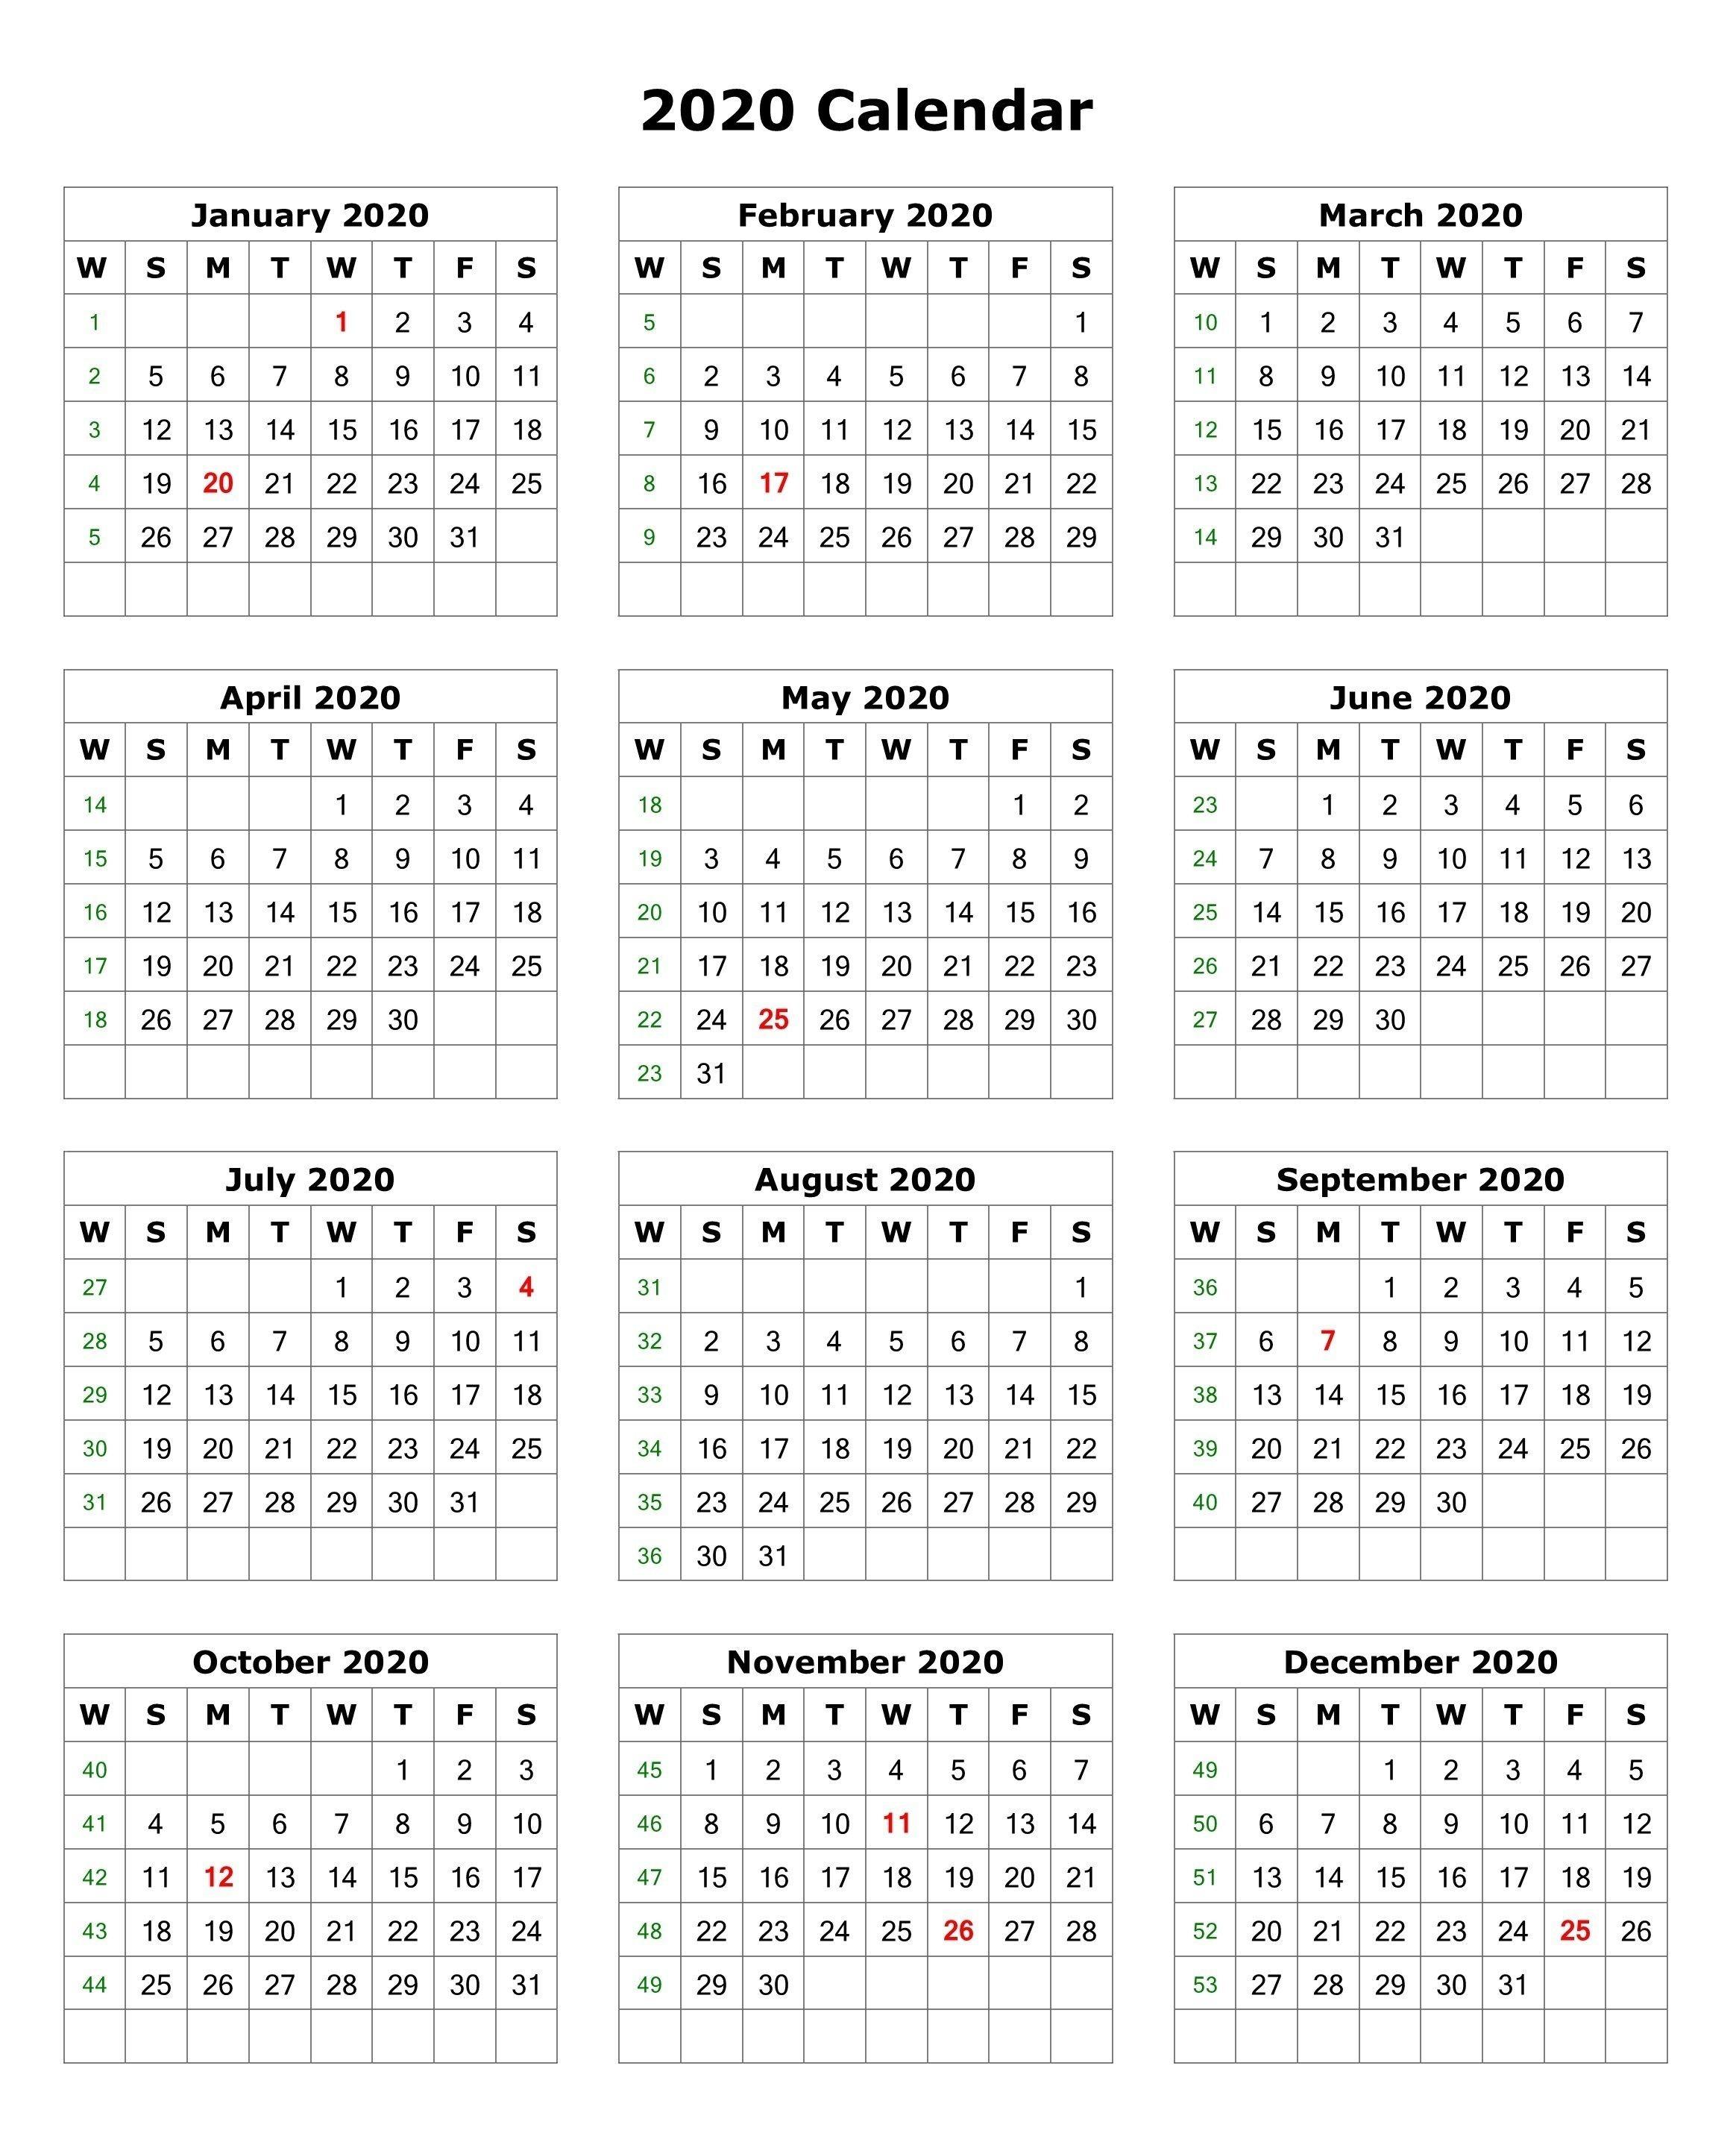 2020 One Page Portrait Calendar | 2020 Calendars | Monthly-6 Month Blank Calendar 2020